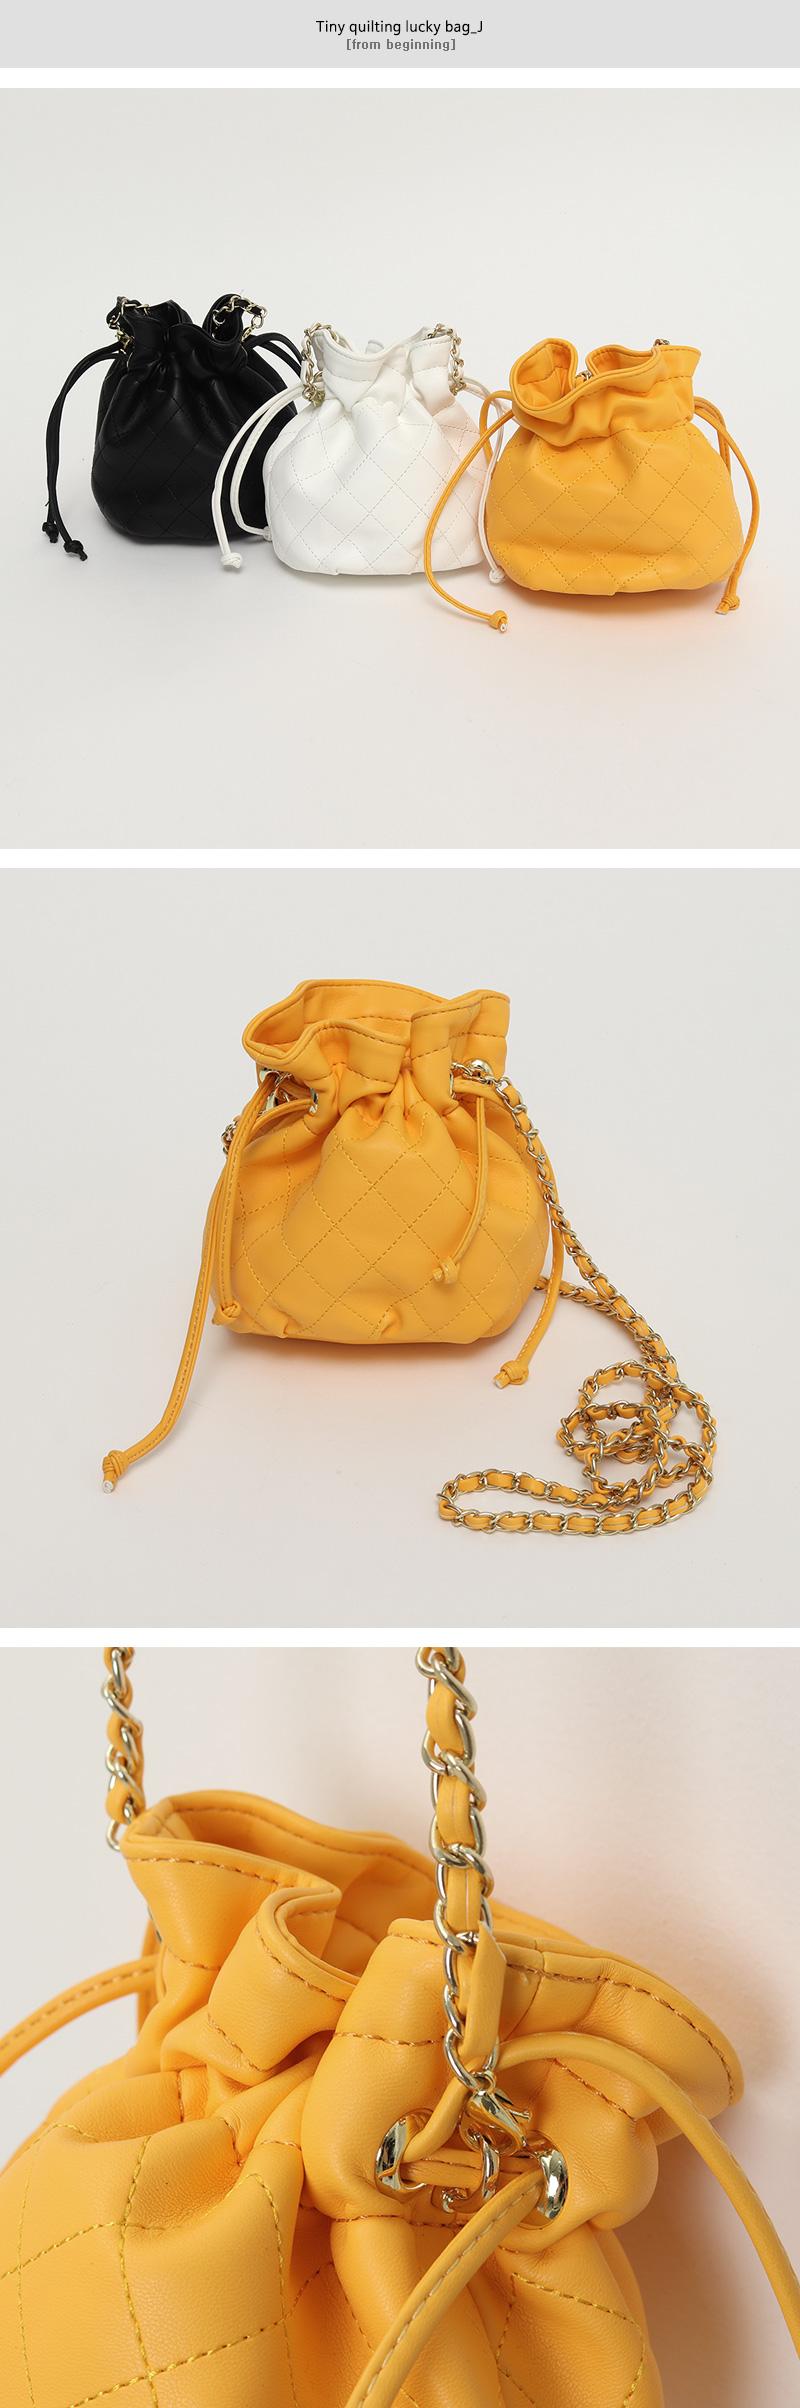 Tiny quilting lucky bag_J